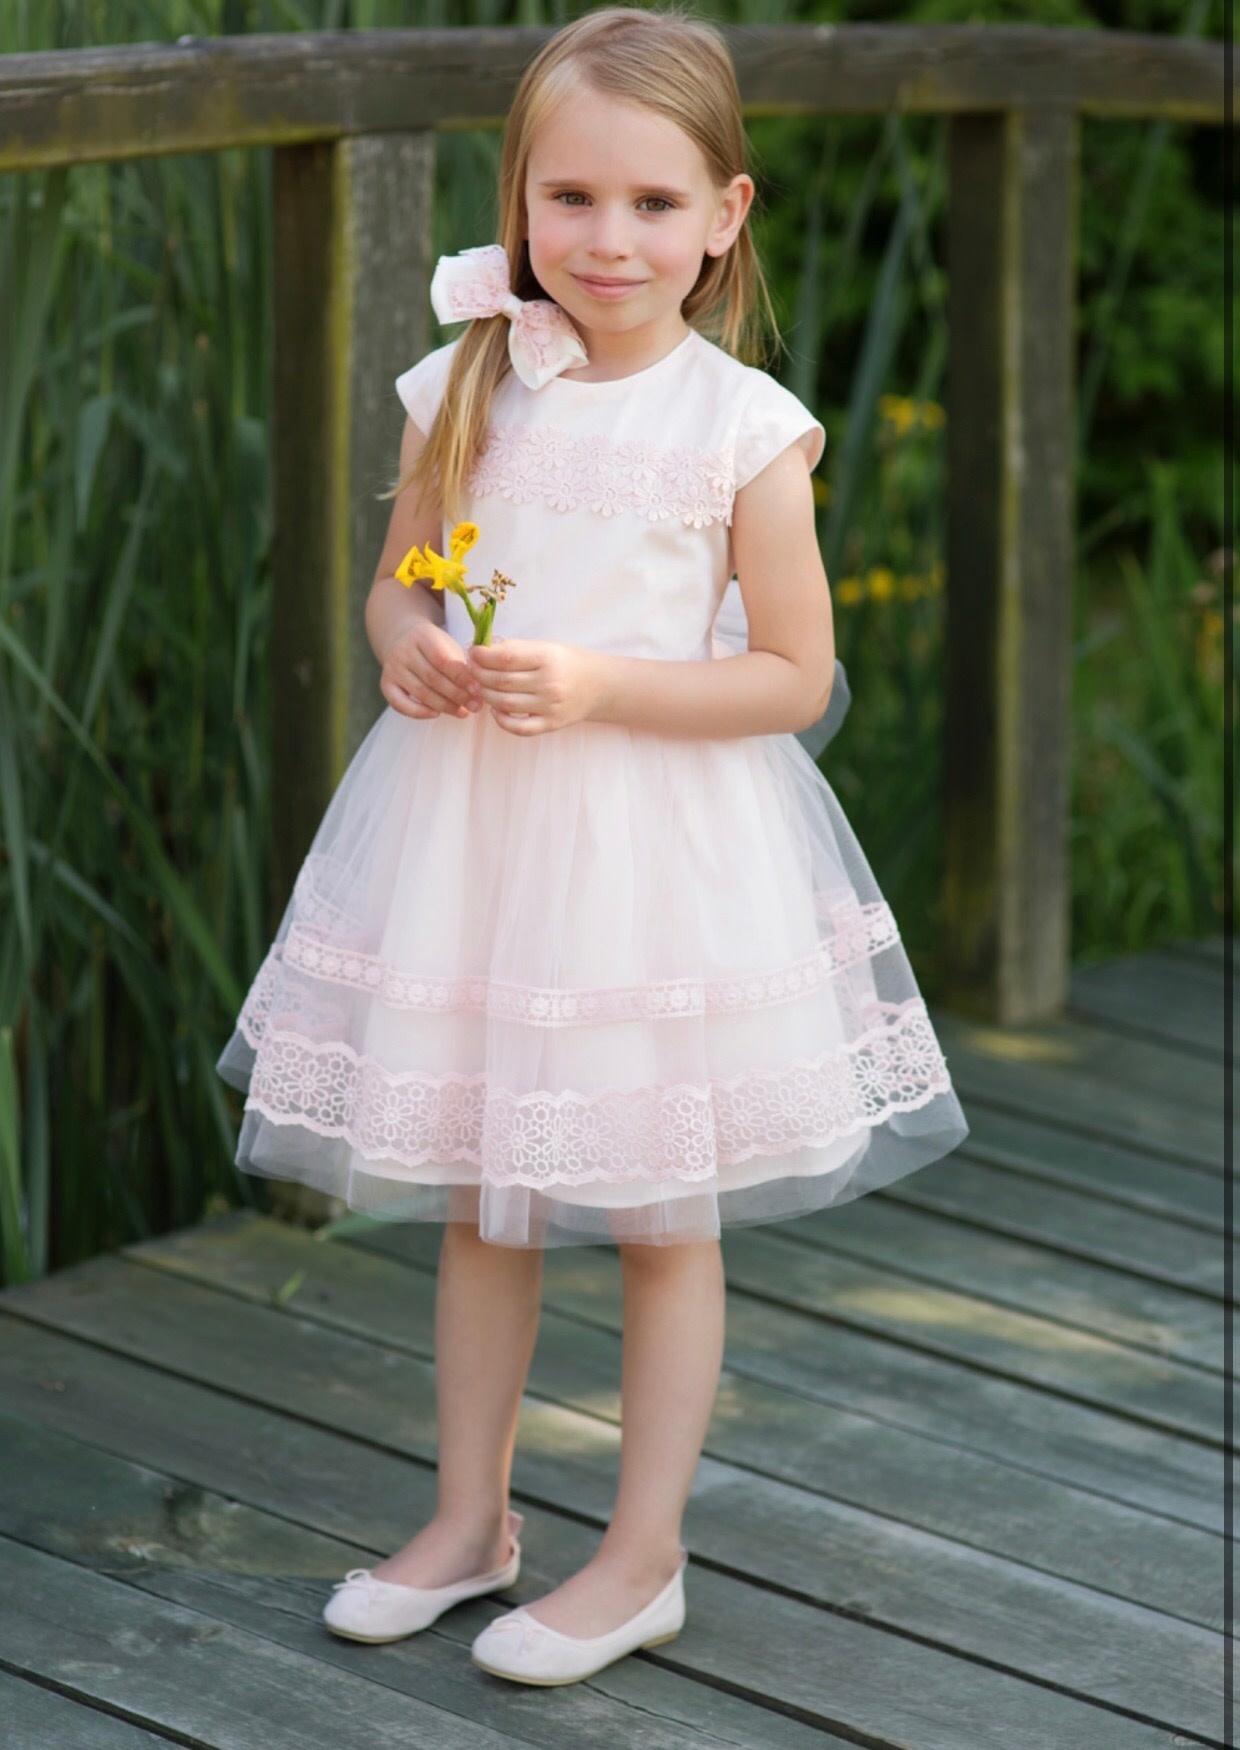 Daga Daga Pink Dress with Daisy Macrame Flower Detail